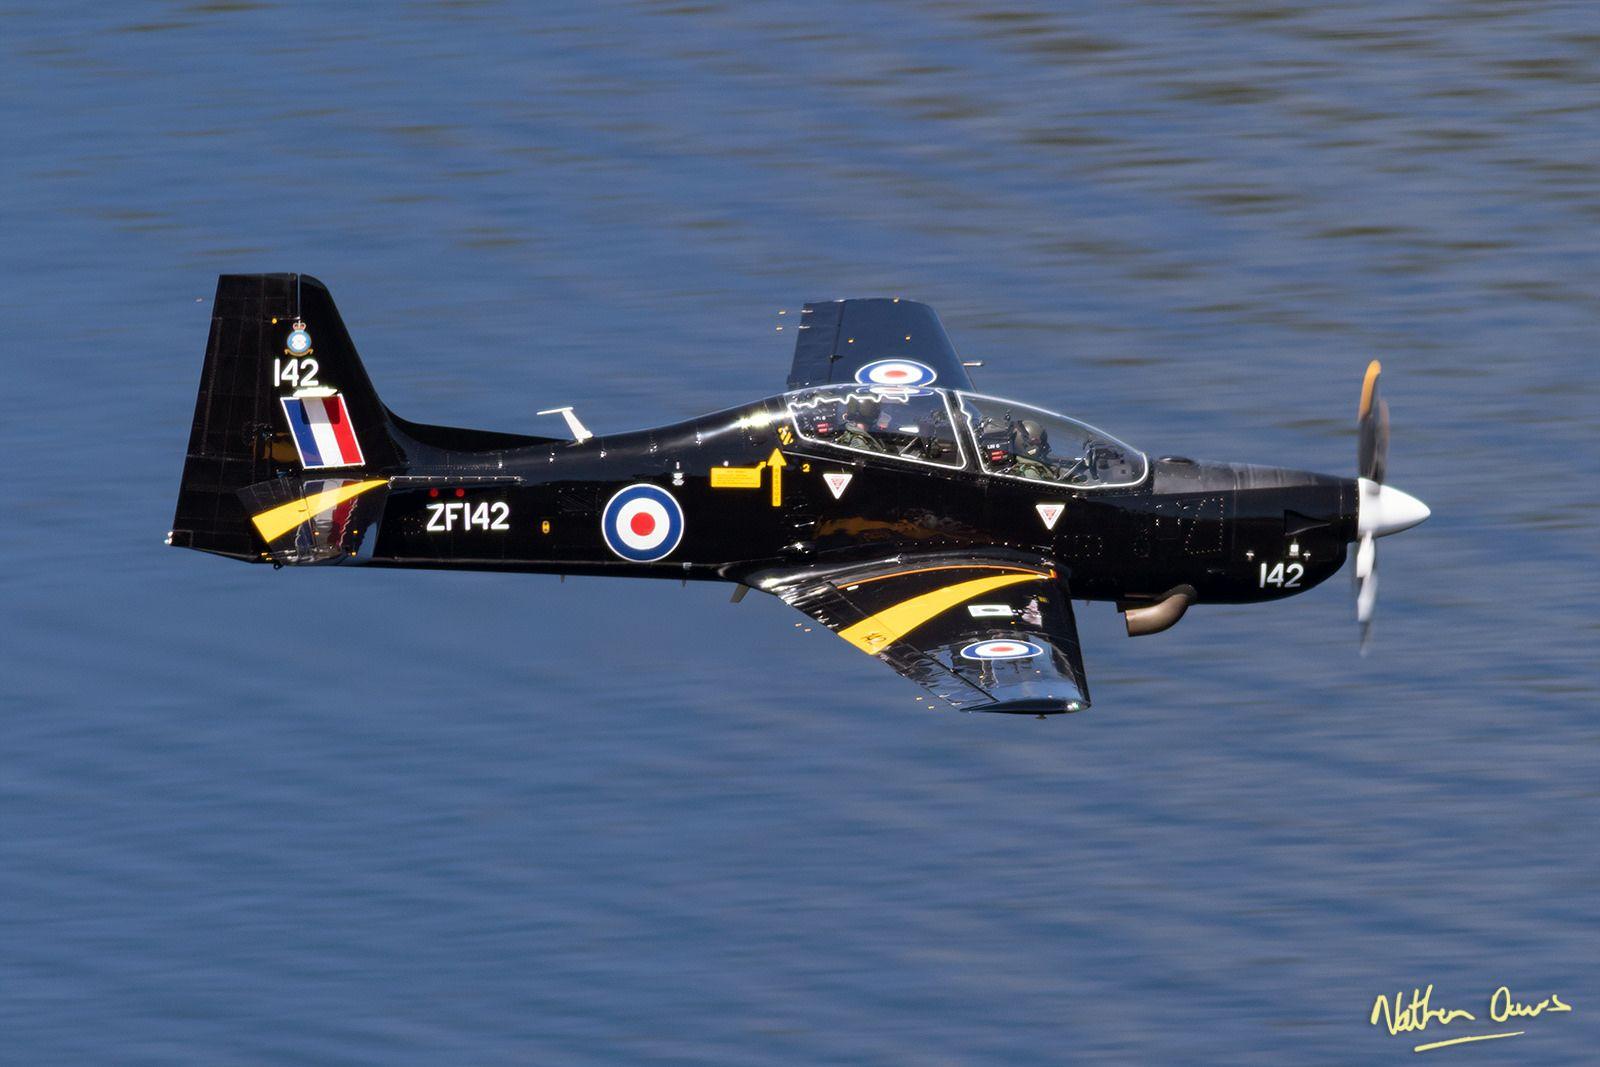 https://flic.kr/p/VhTf5s | RAF Shorts Tucano T.1 ZF142 low level at Ullswater